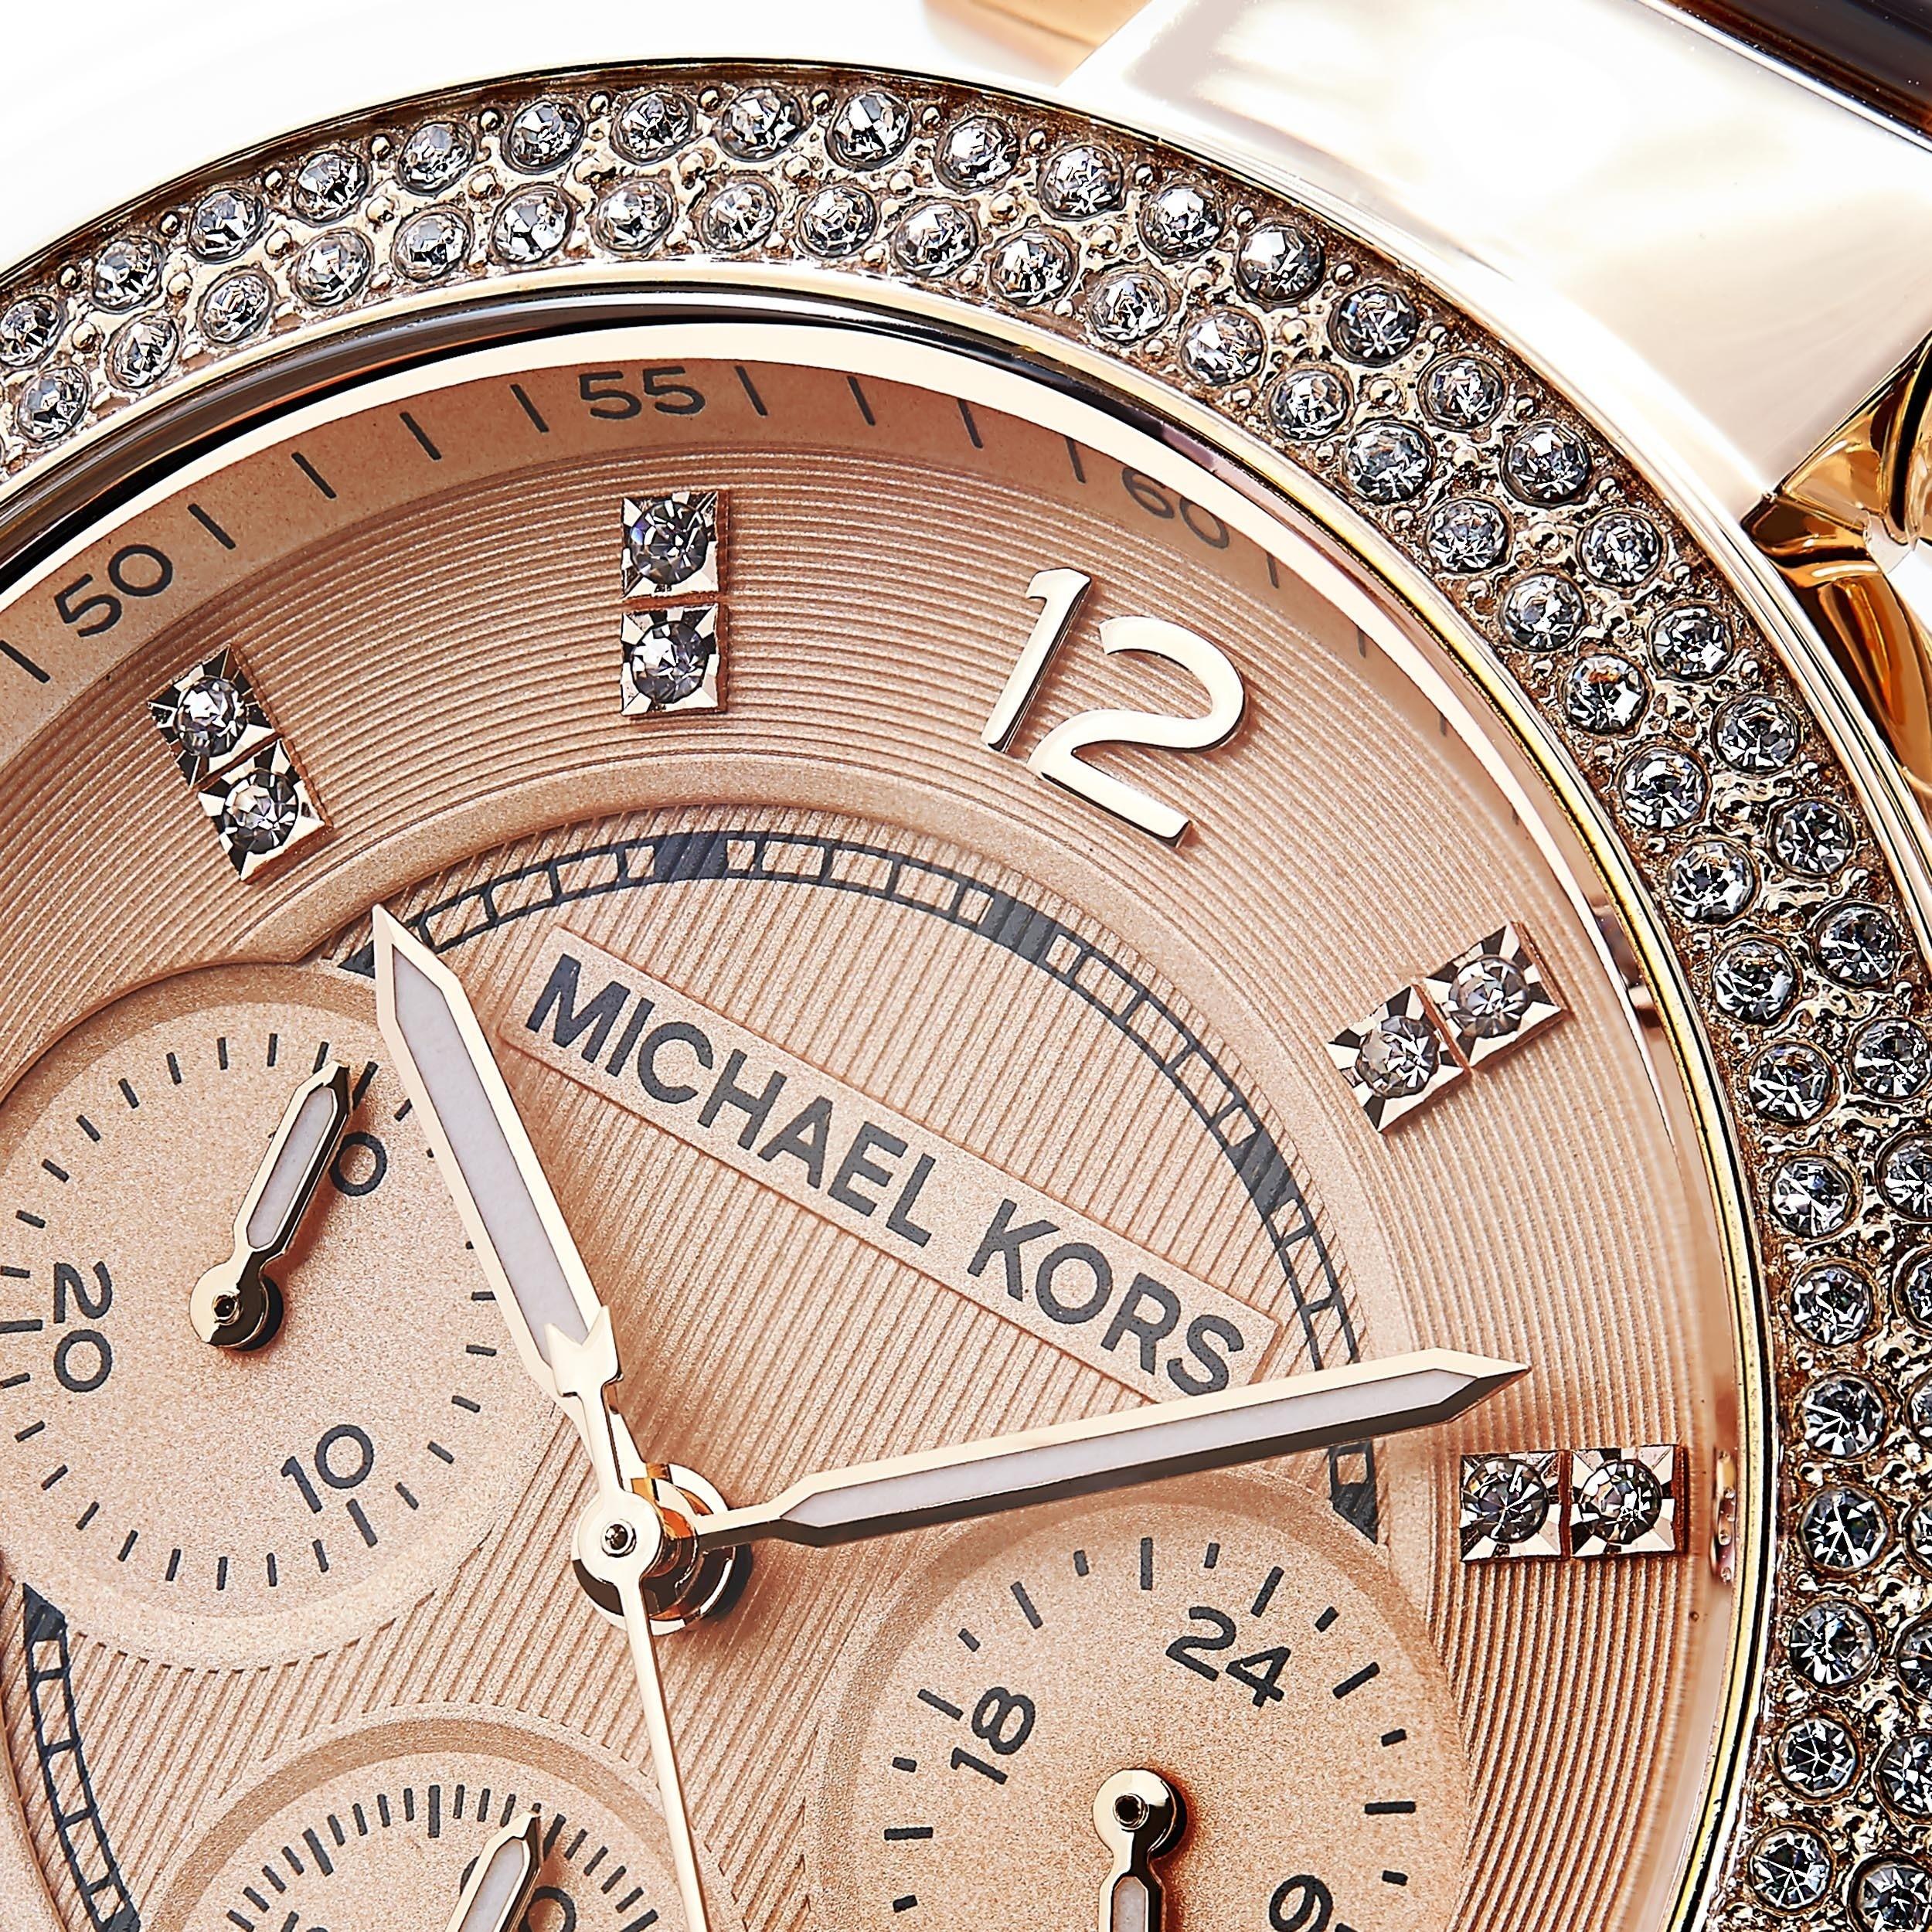 69bb616275b9 Shop Michael Kors Women s MK5538  Parker  Rosetone and Tortoise Resin Glitz  Watch - Free Shipping Today - Overstock - 6348163